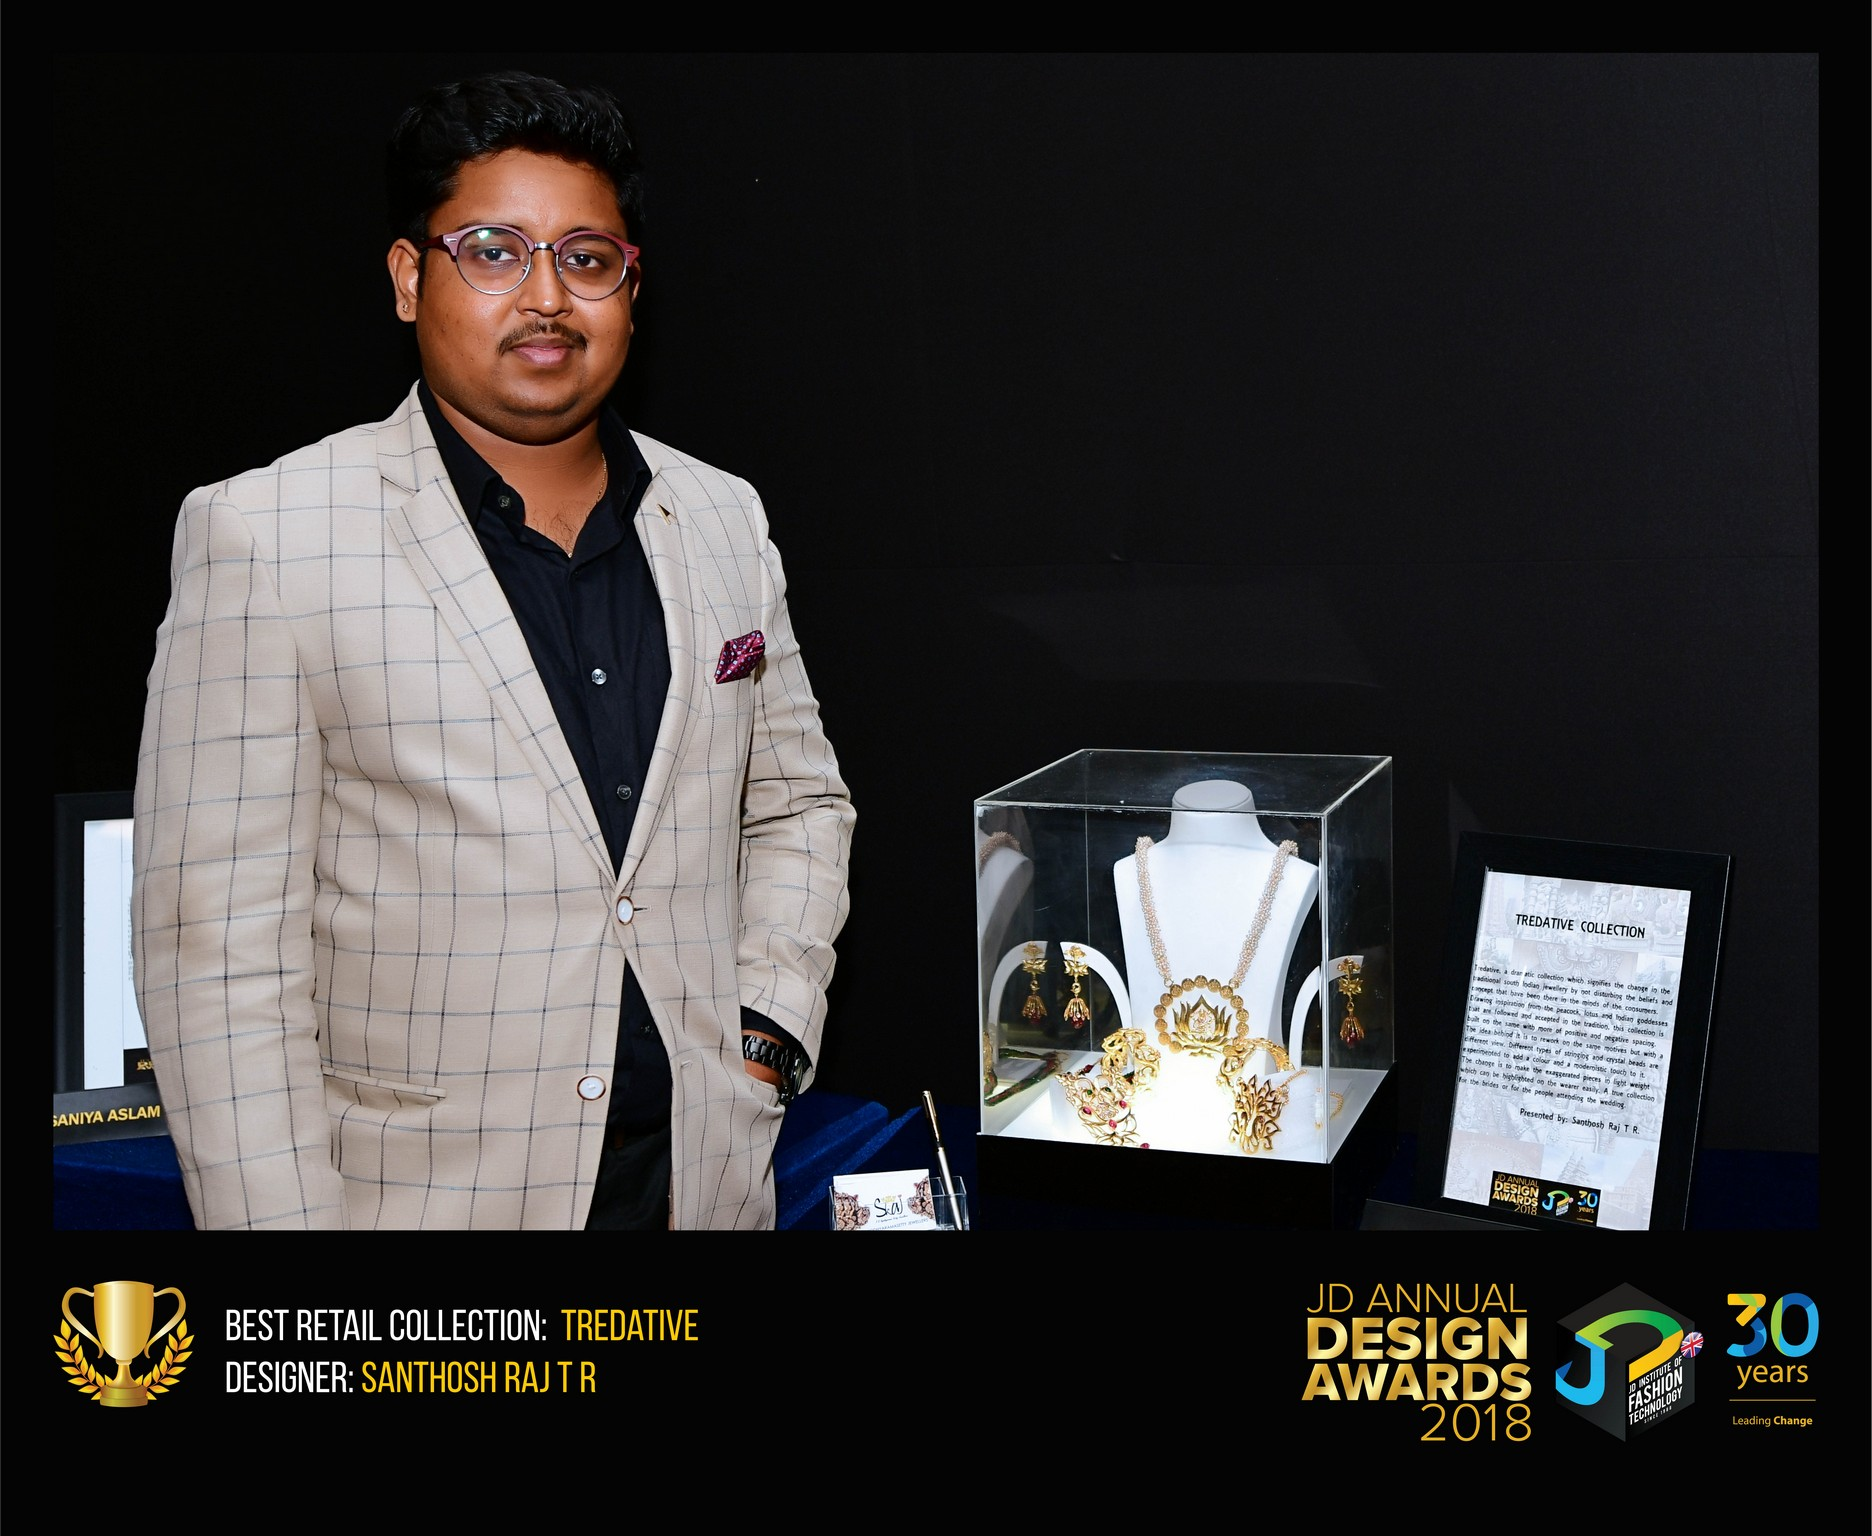 tredative - Santhosh Raj T R5 - Tredative – Change – JD Annual Design Awards 2018